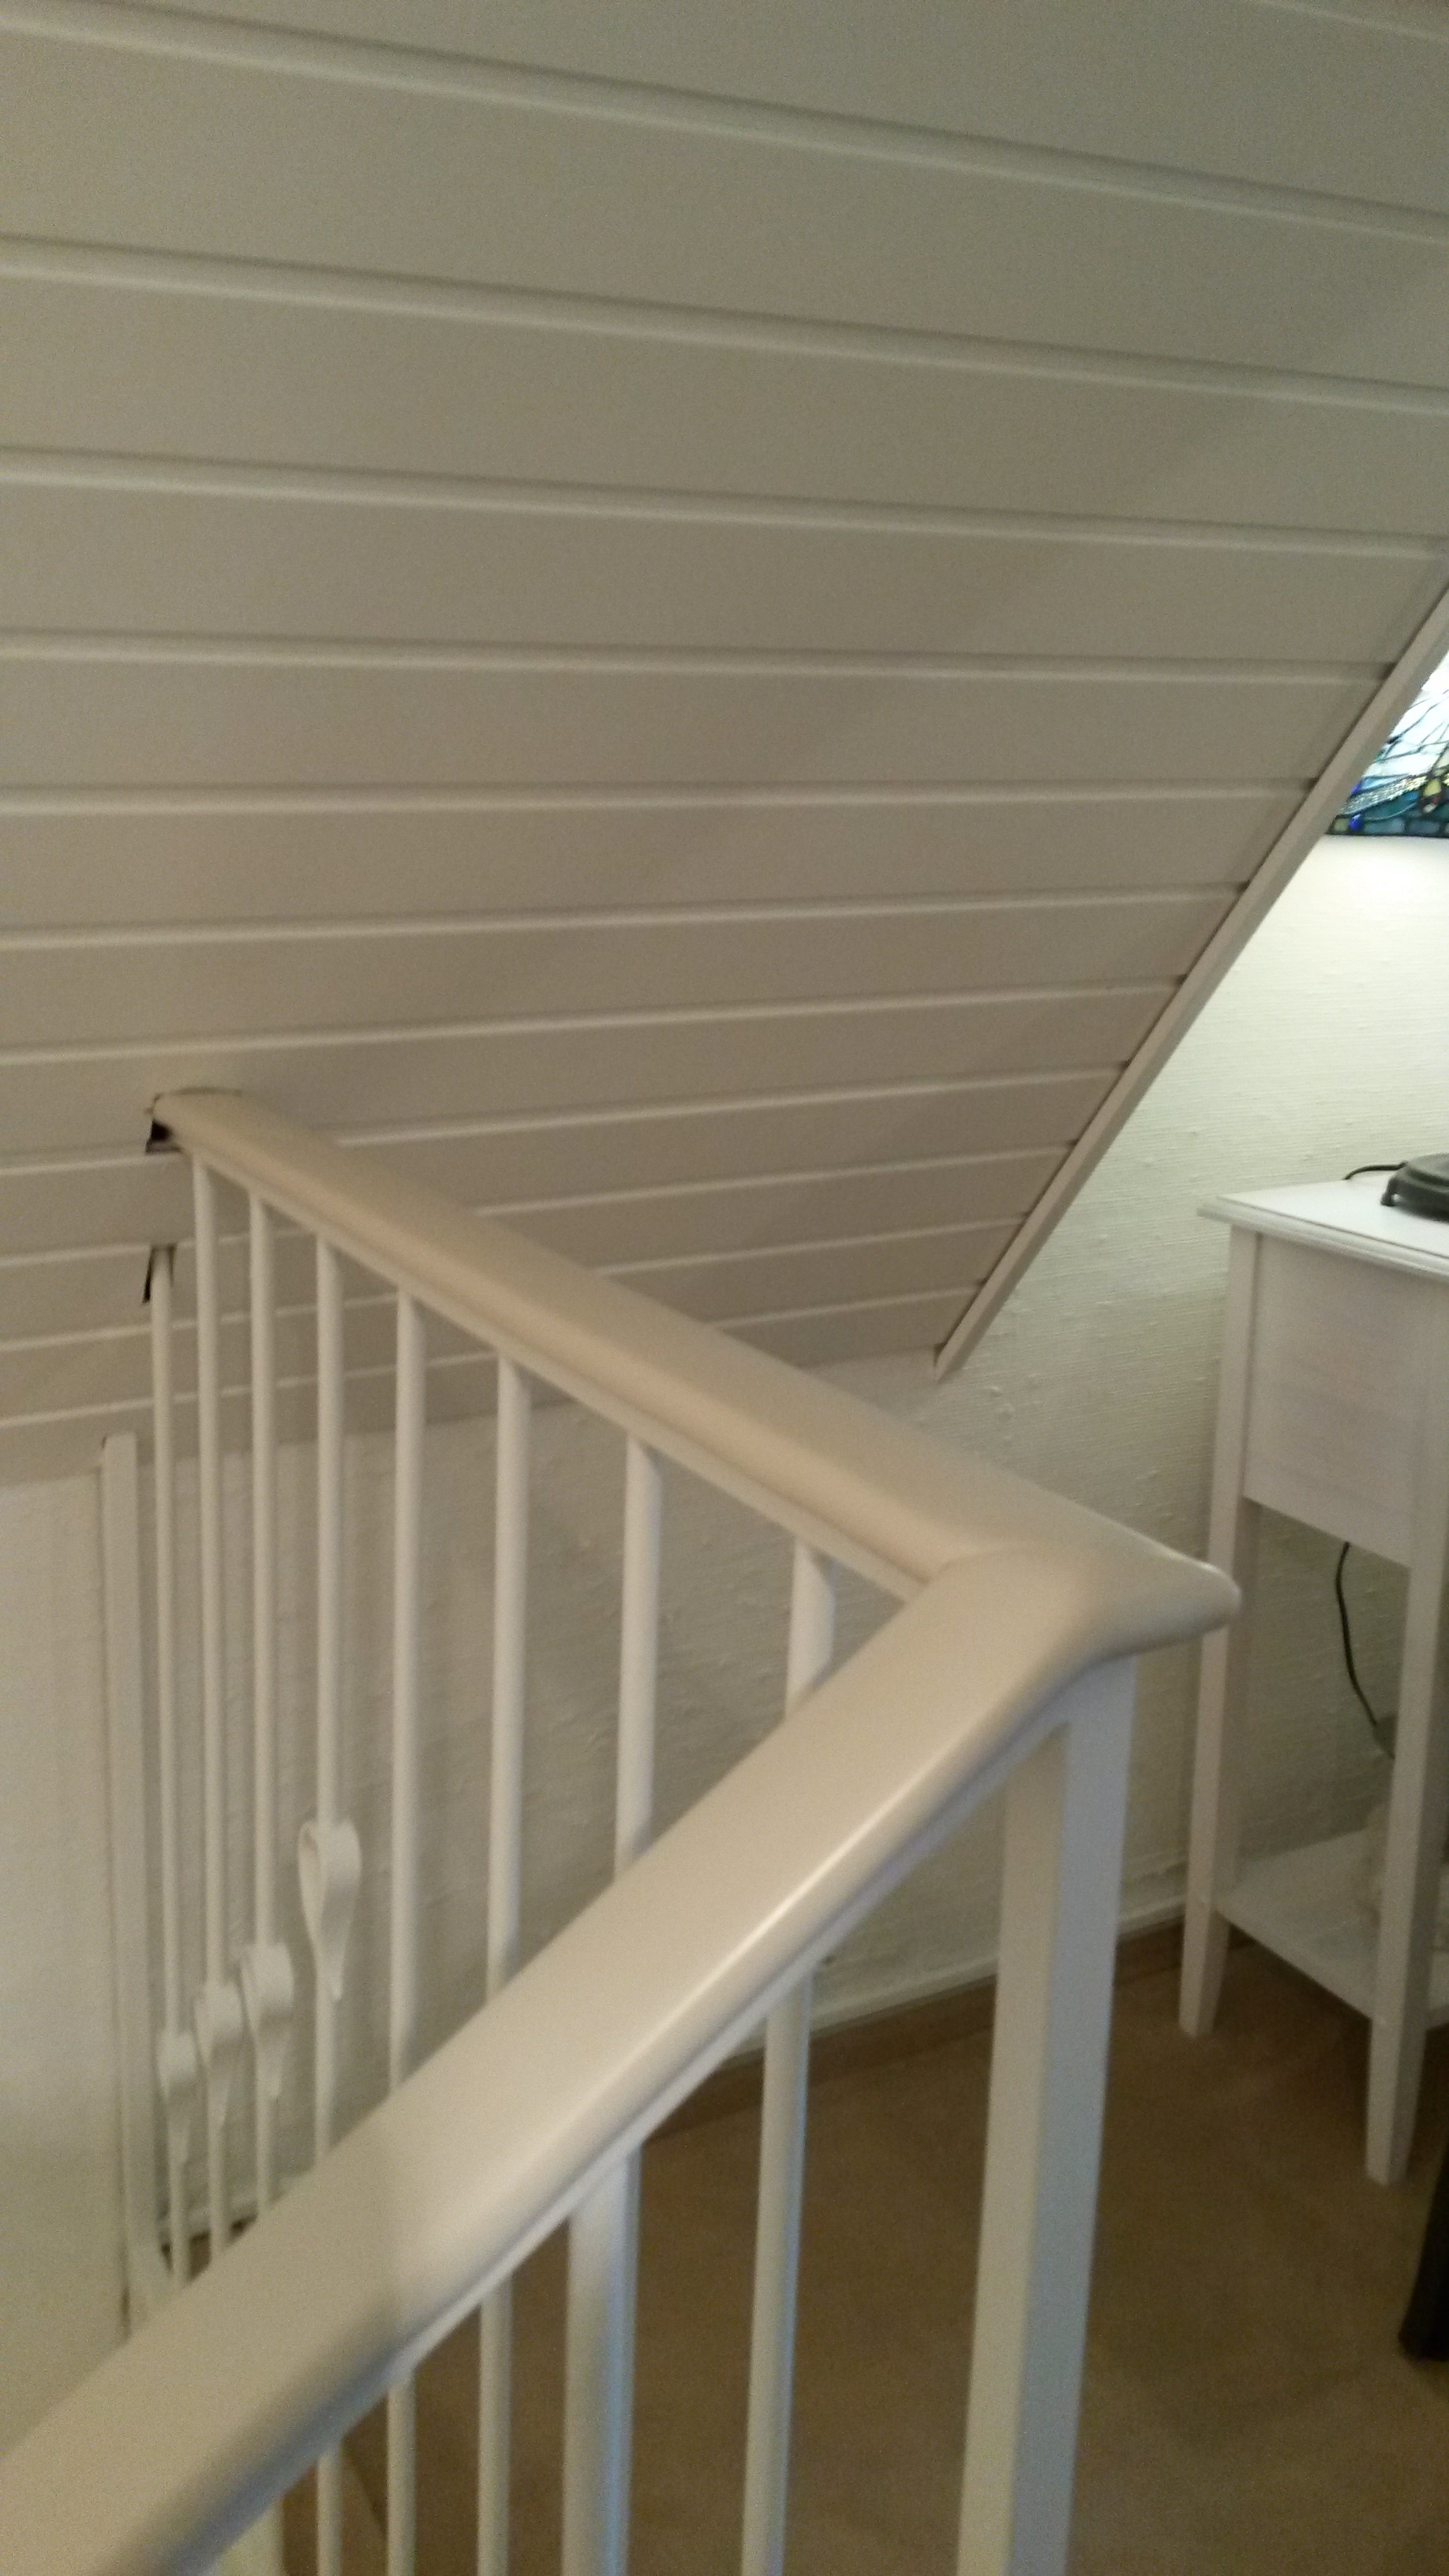 handl ufe aus kunststoff handlauf in kunststoff in perlweiss. Black Bedroom Furniture Sets. Home Design Ideas